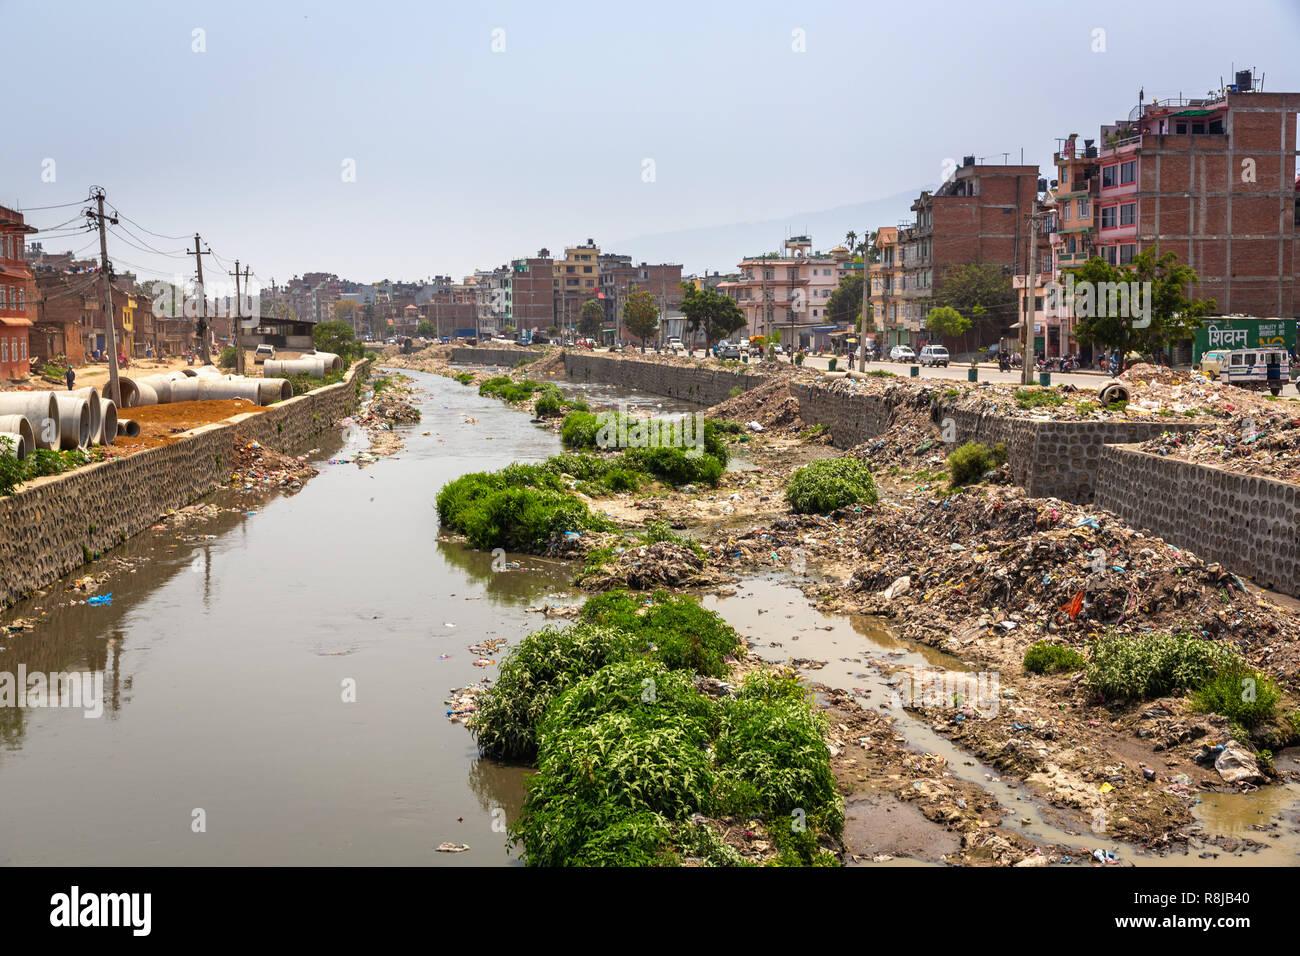 View of the polluted Bagmati River in Kathmandu, Nepal - Stock Image